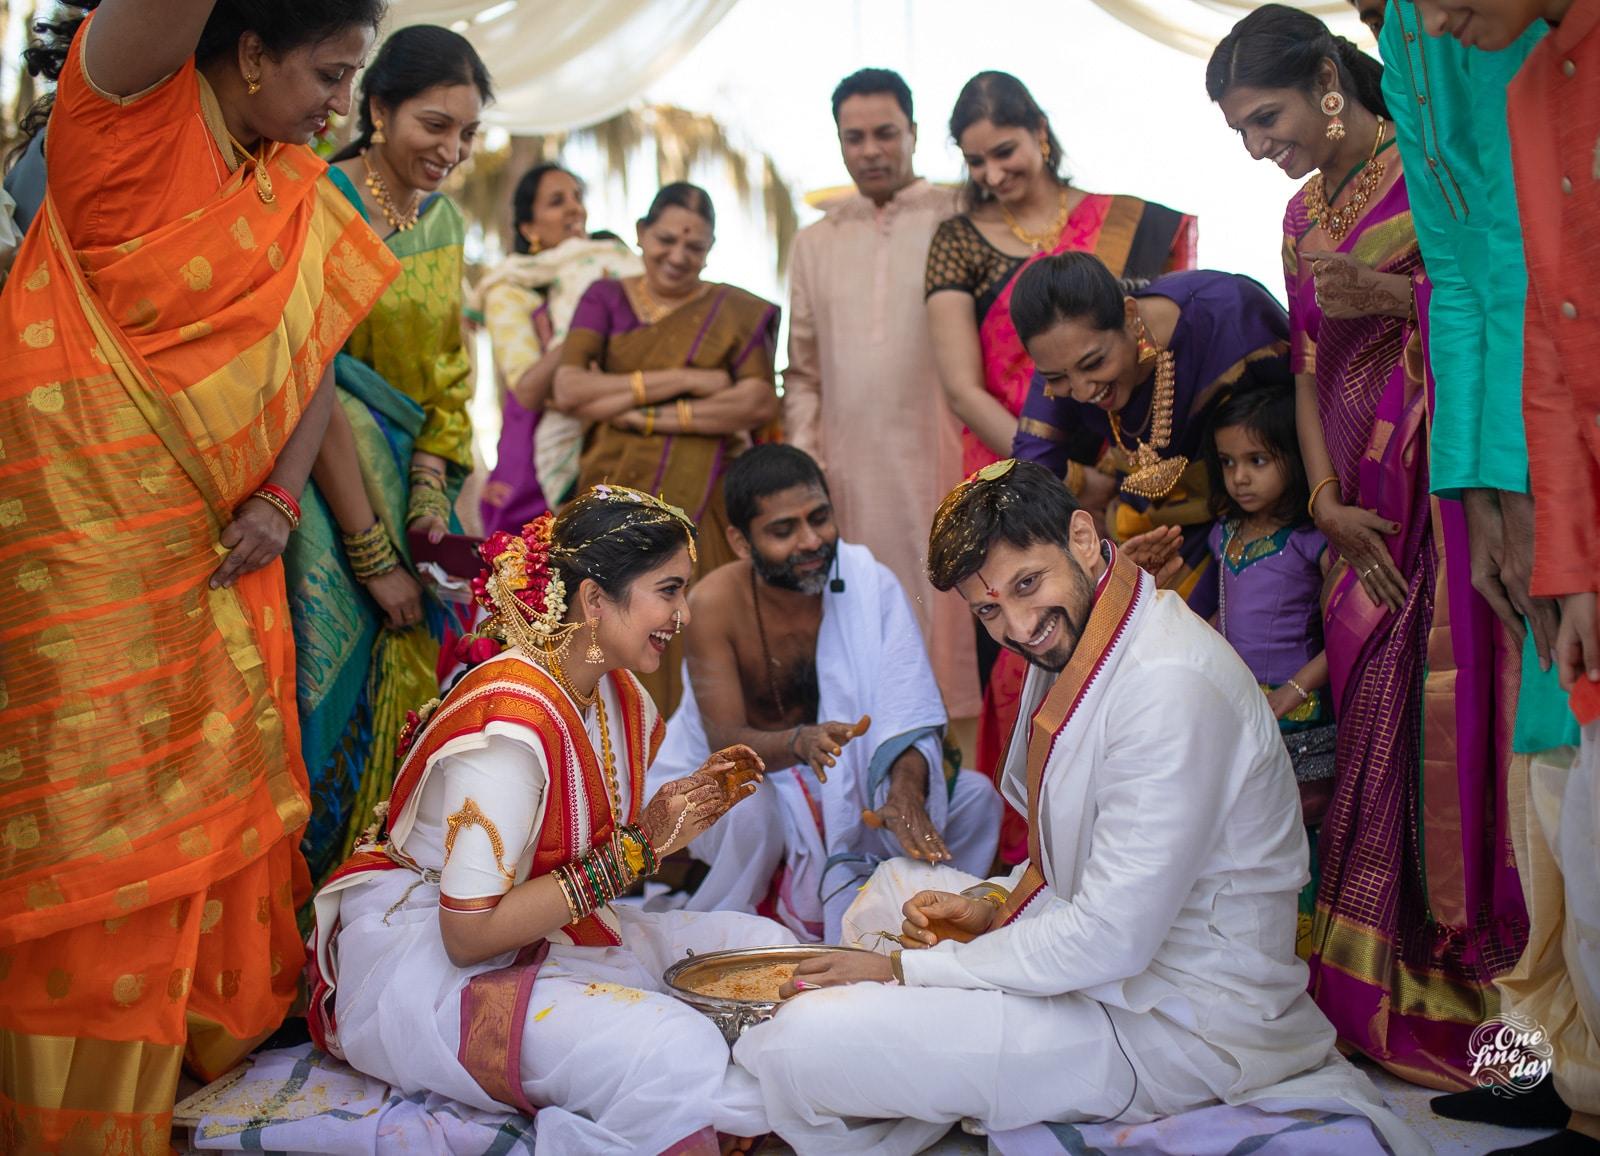 Indian wedding ceremony show by a Wedding Vendor that Celebrates Diversity